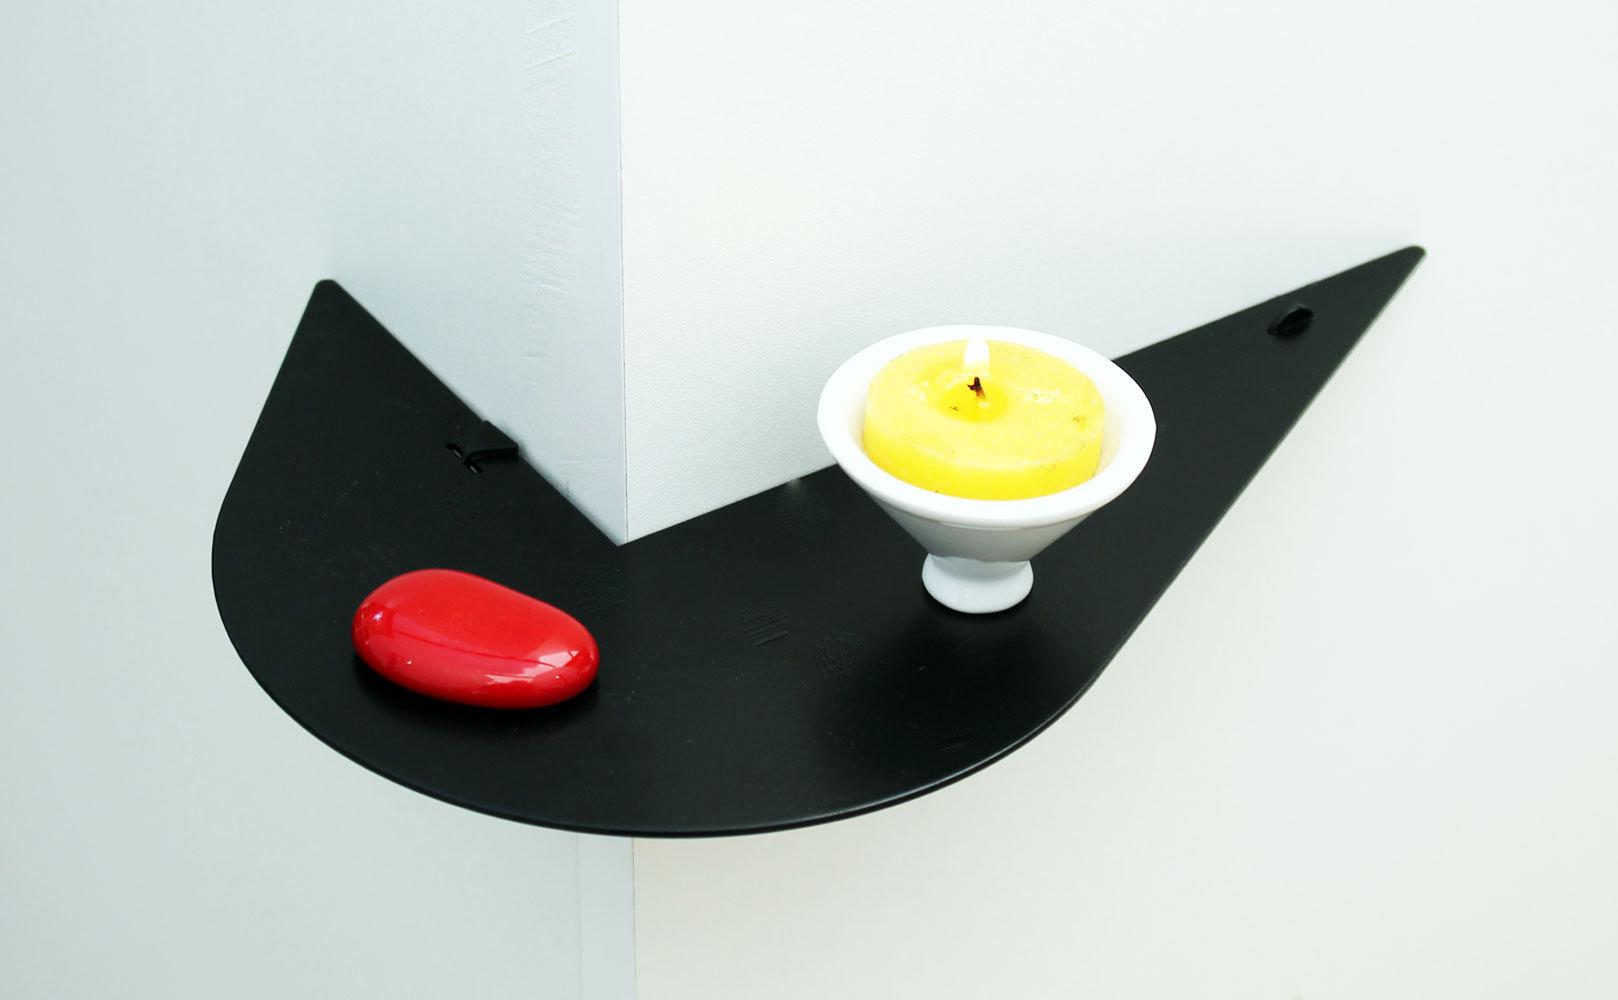 etag re murale d 39 angle zell noire tag re d 39 angle moderne. Black Bedroom Furniture Sets. Home Design Ideas